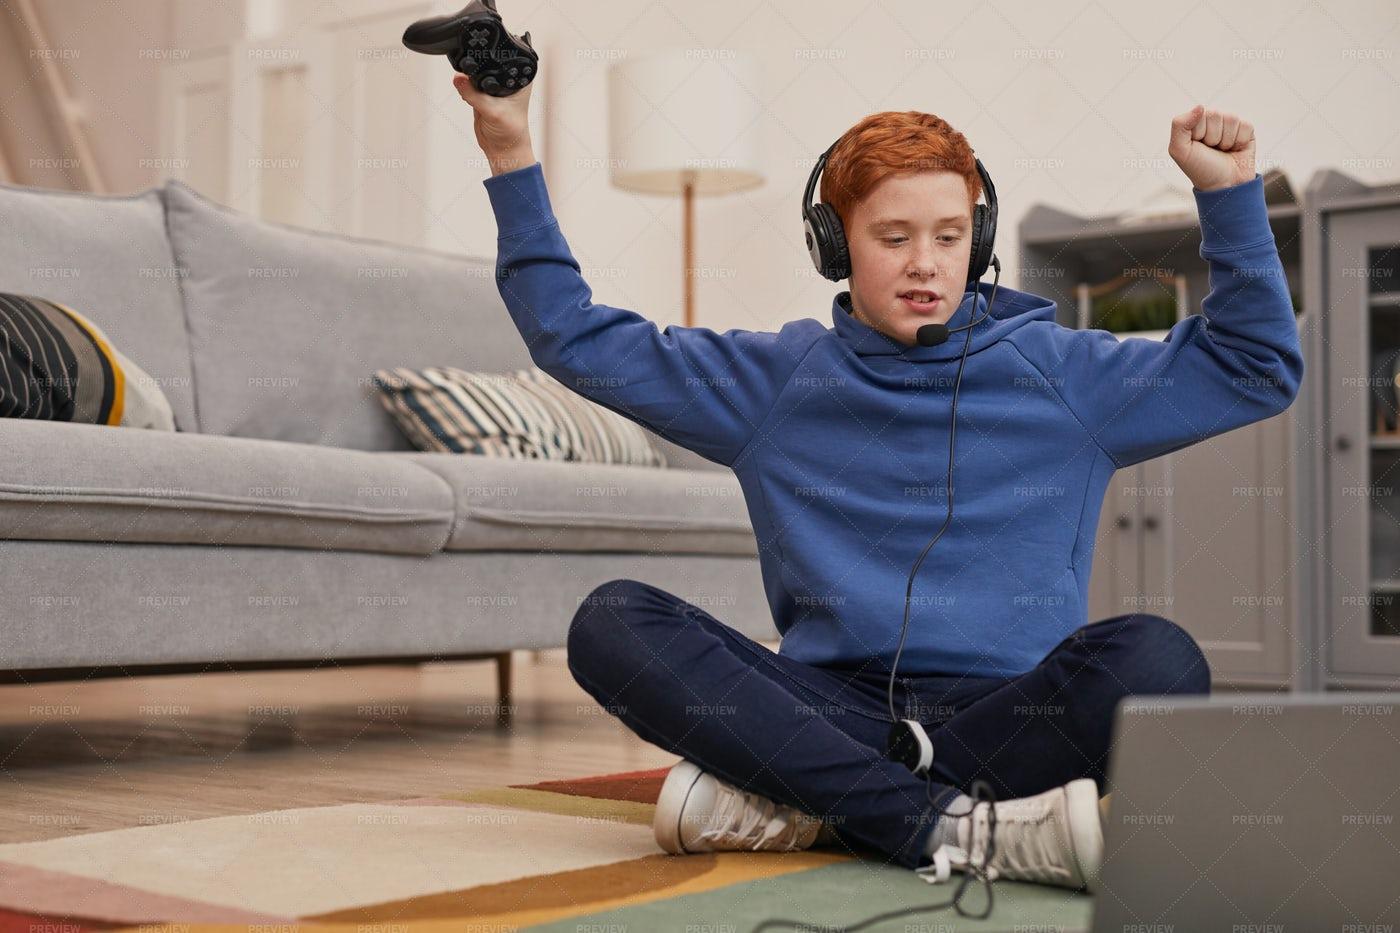 Joyful Boy Playing Video Games: Stock Photos